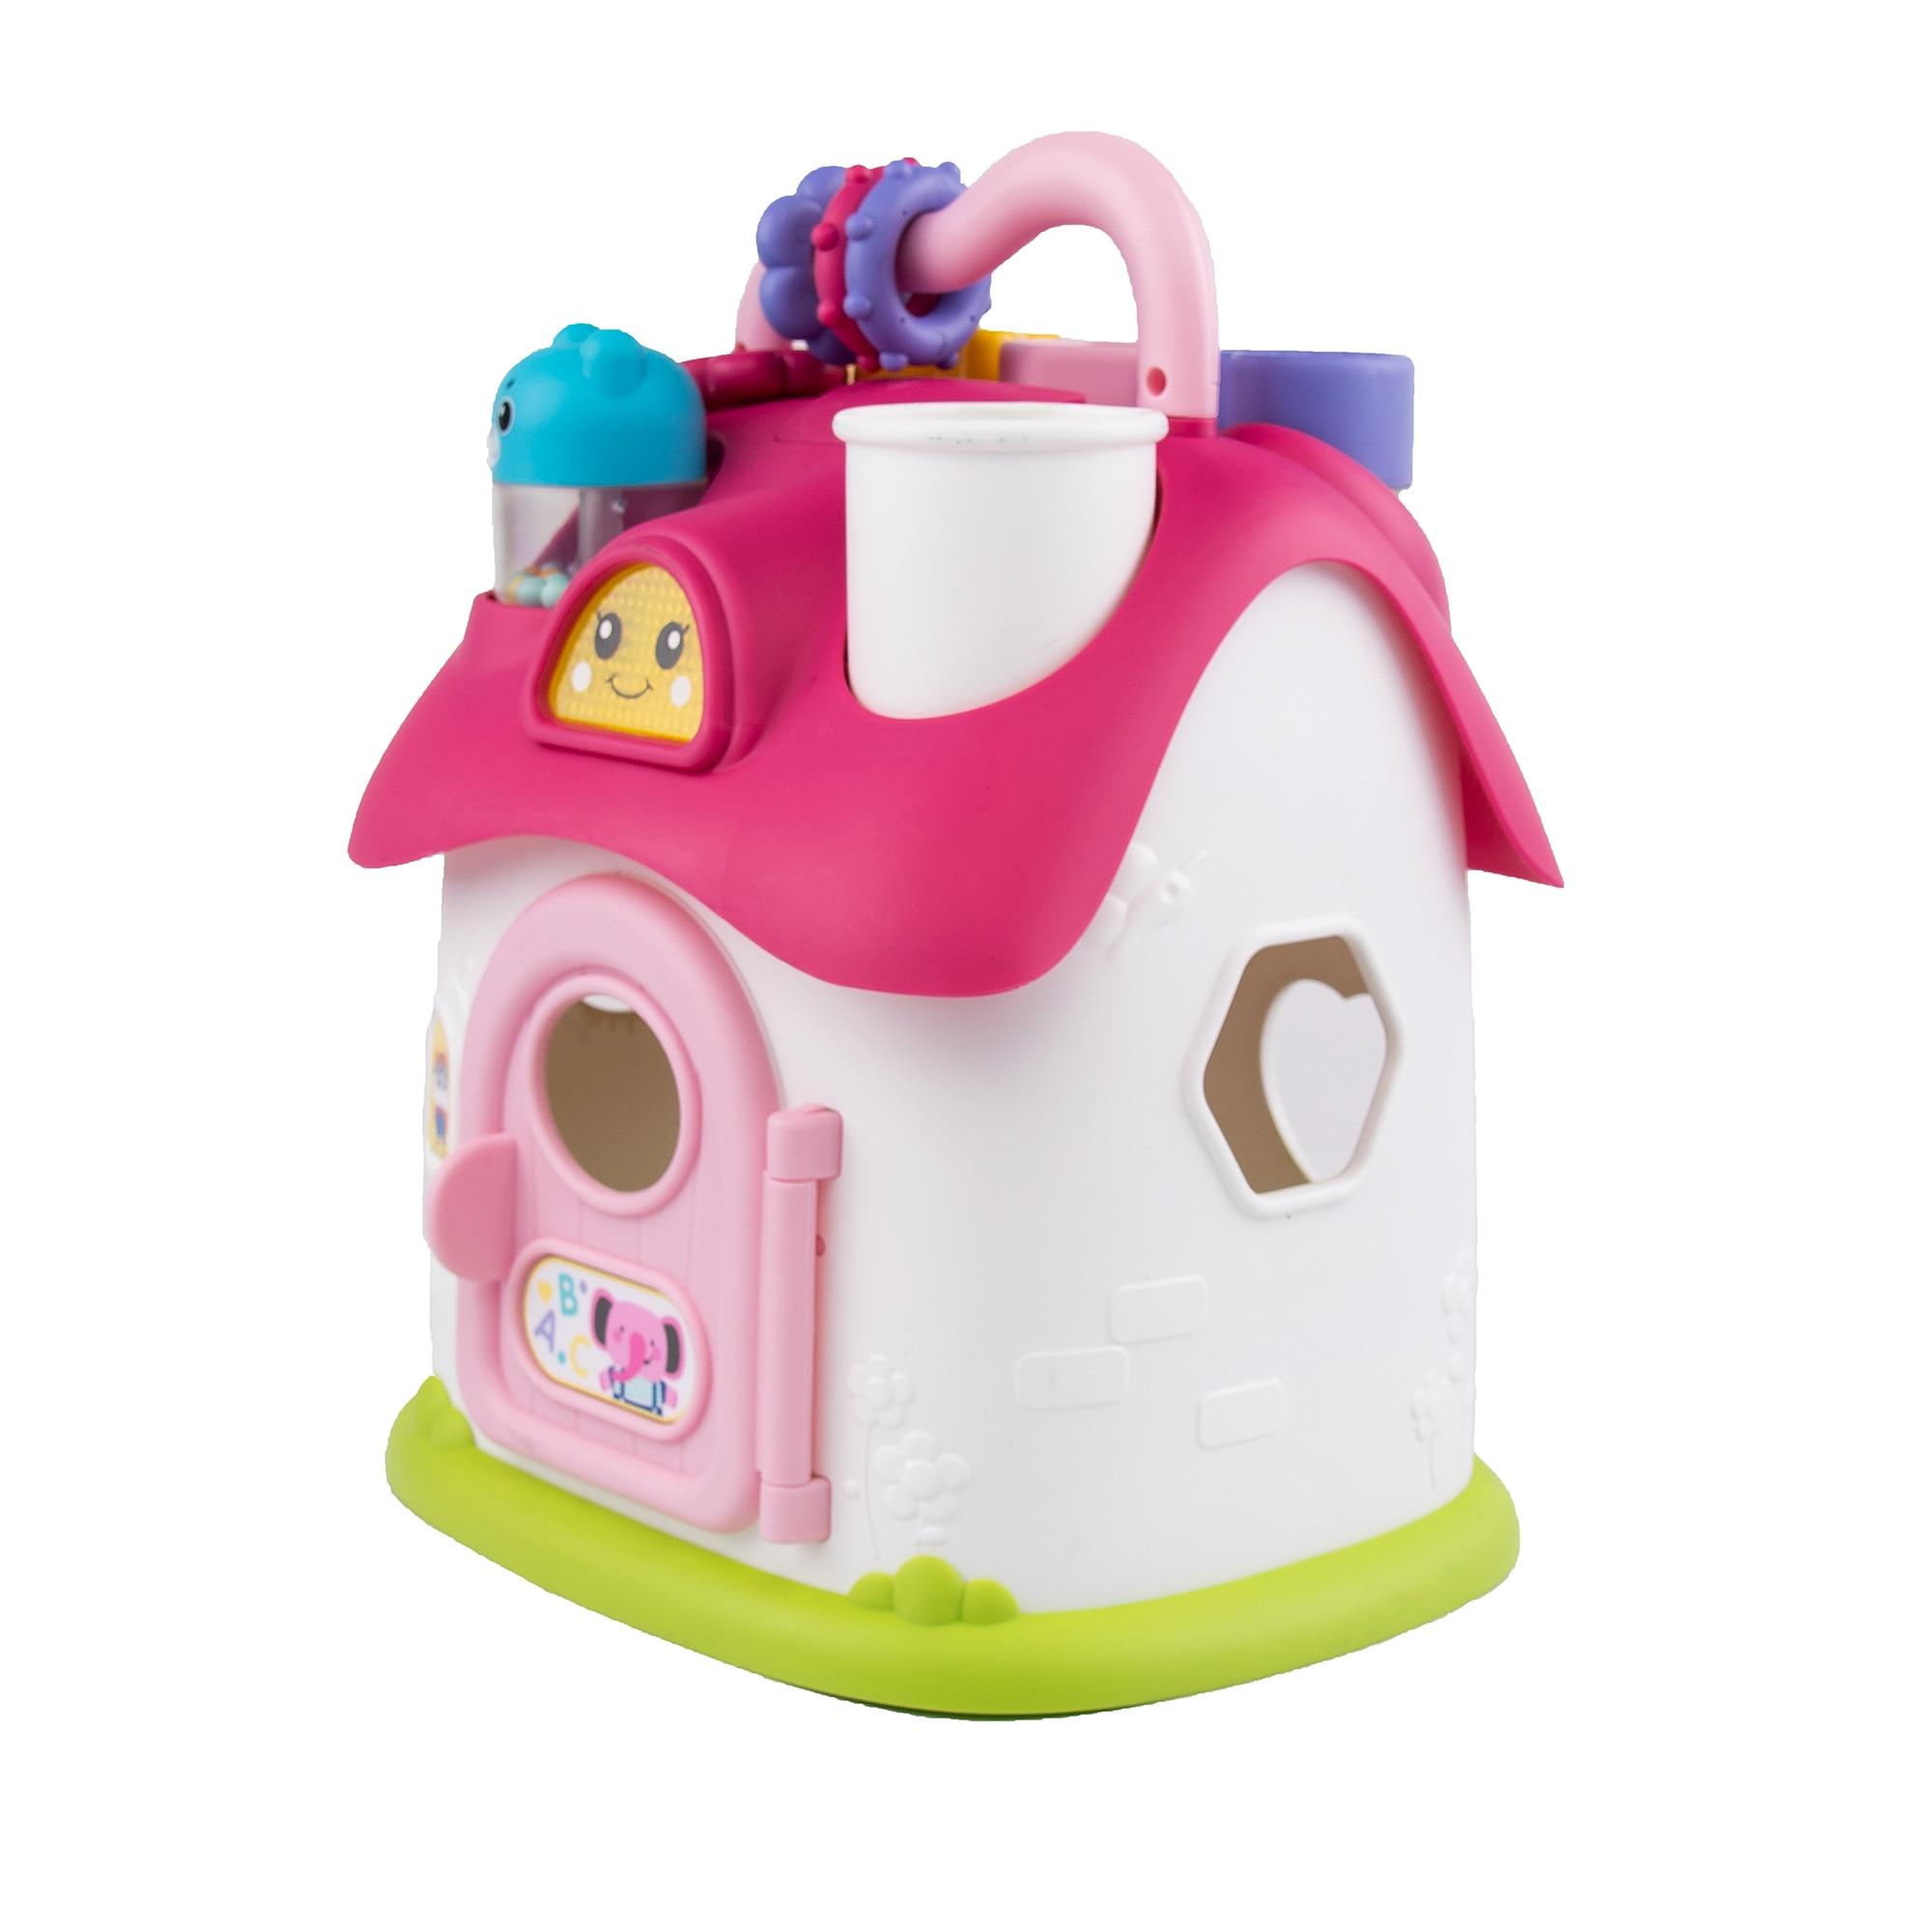 Fotografie Jucarie interactiva pentru bebelusi M-Toys Play House, cu lumini si sunete, roz